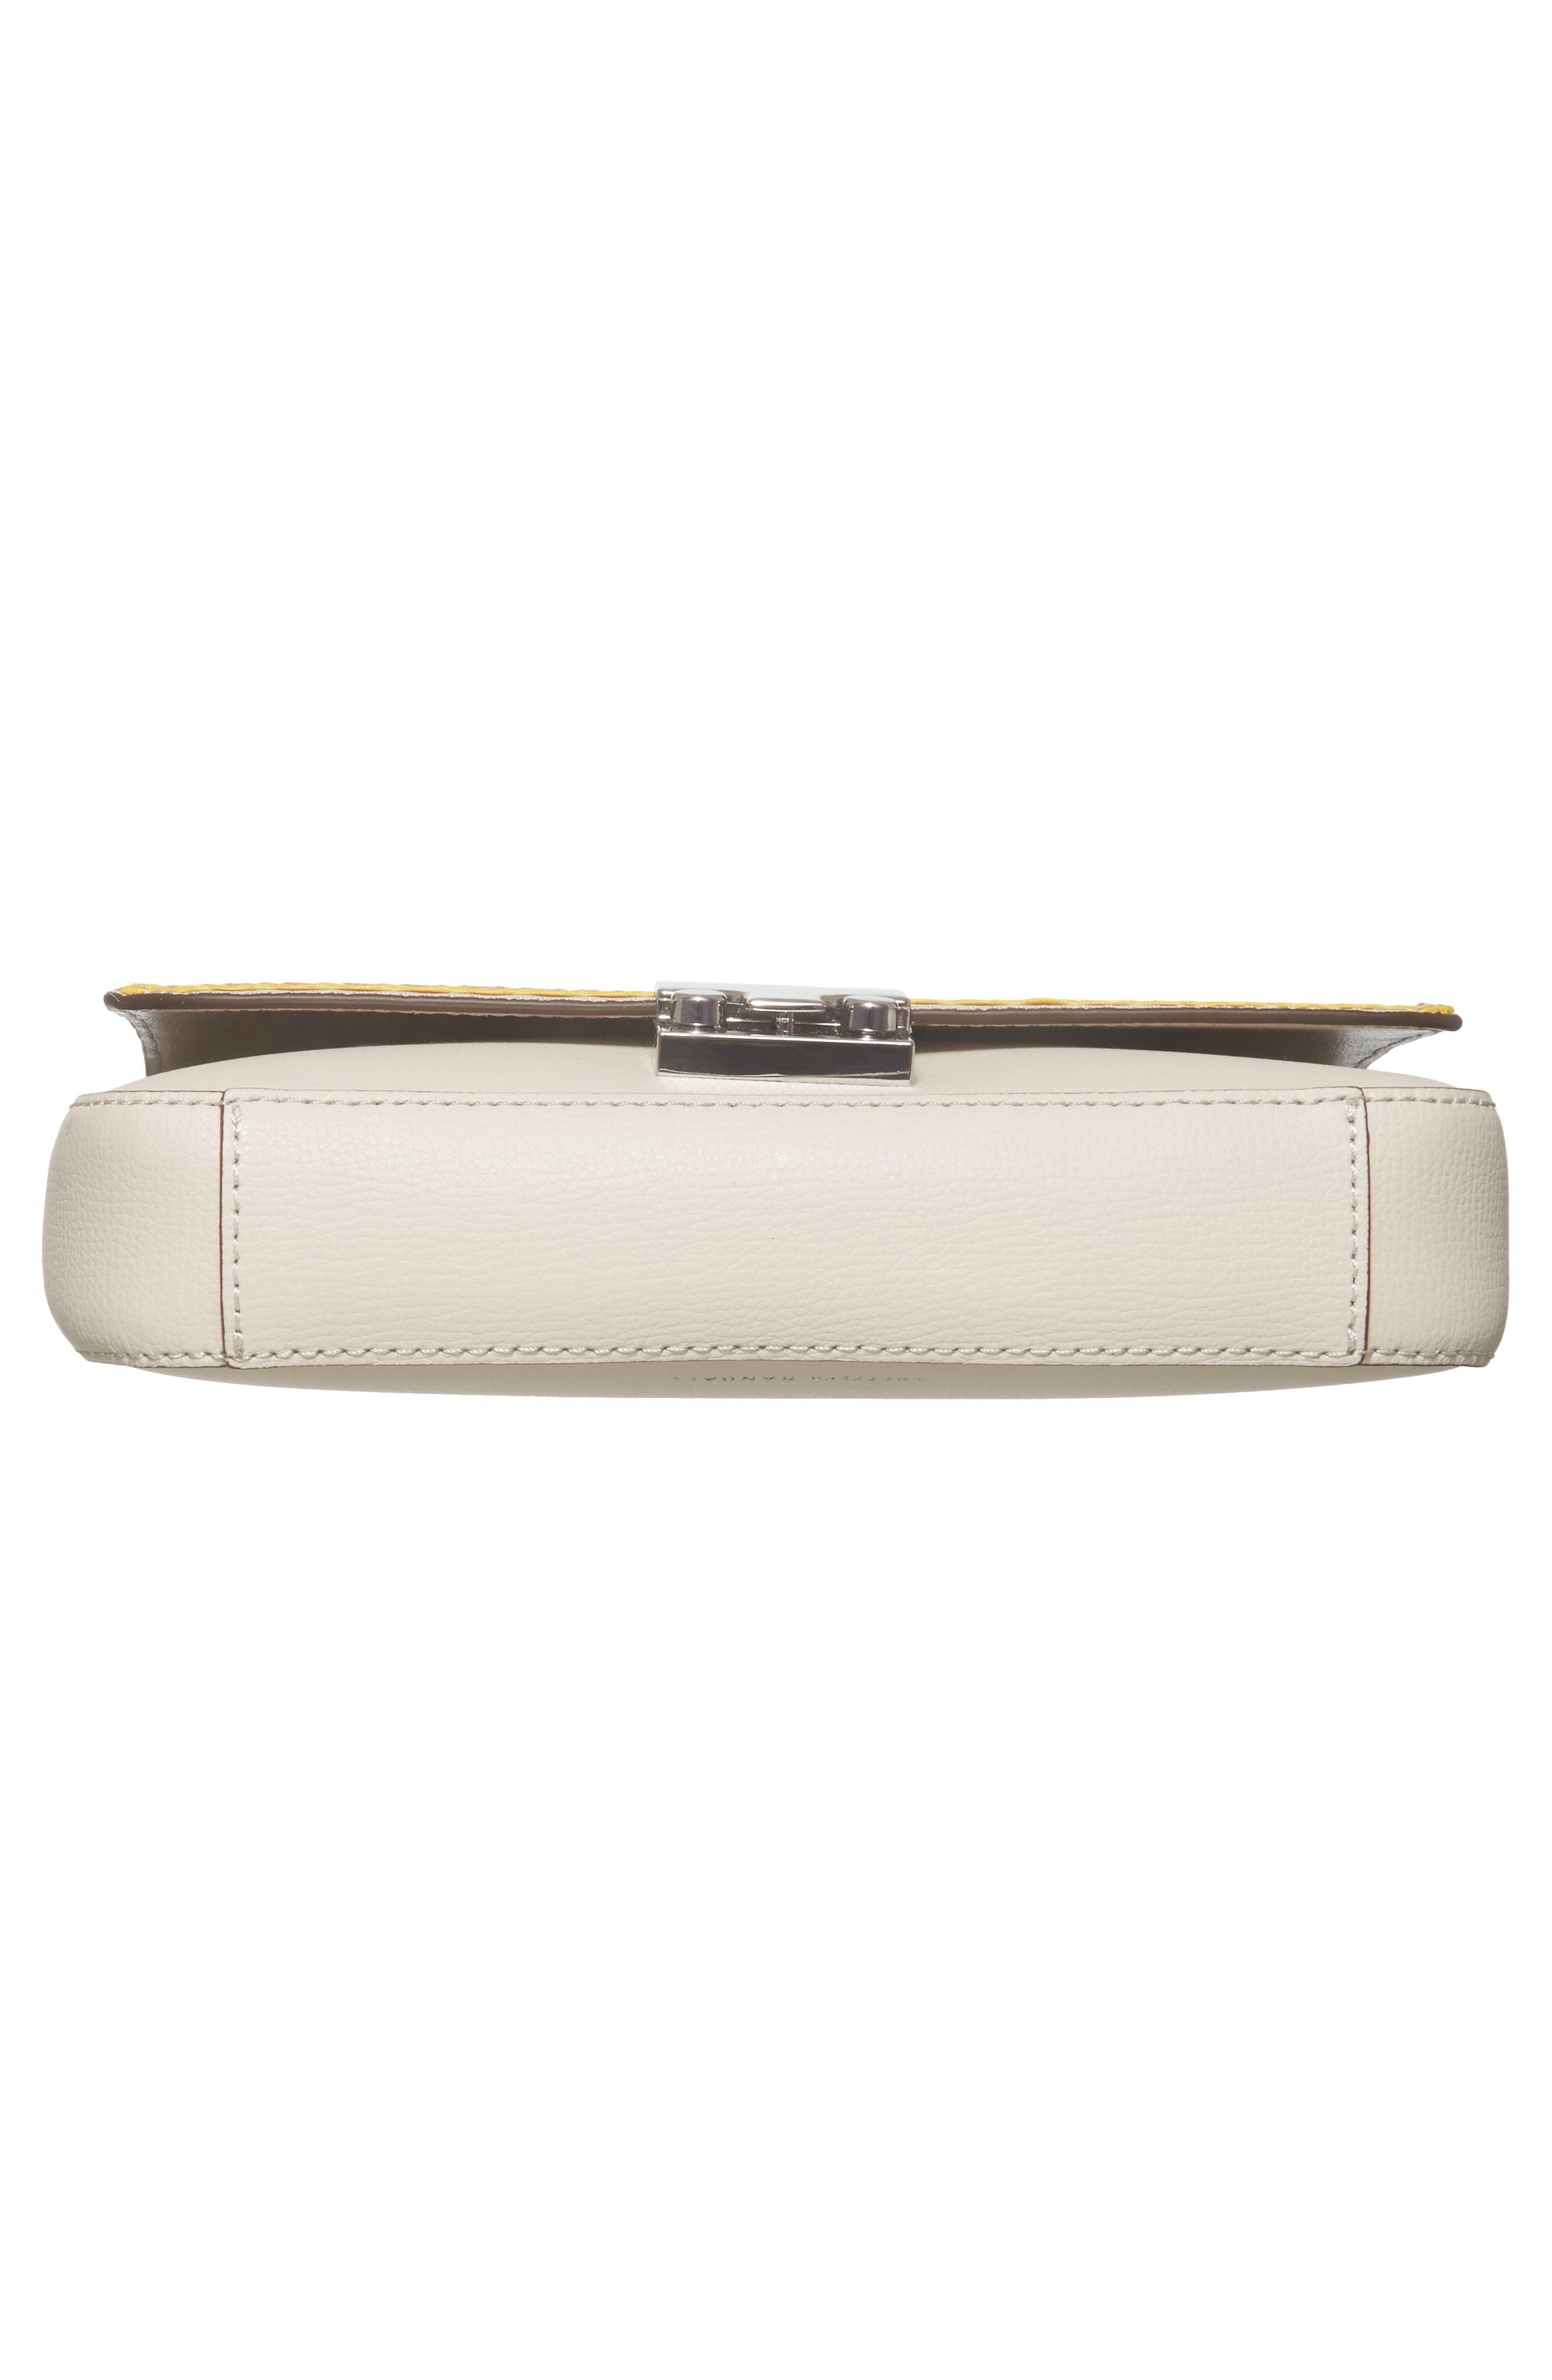 Lock Leather Flap Clutch/Shoulder Bag,                             Alternate thumbnail 6, color,                             Stone/ Rainbow